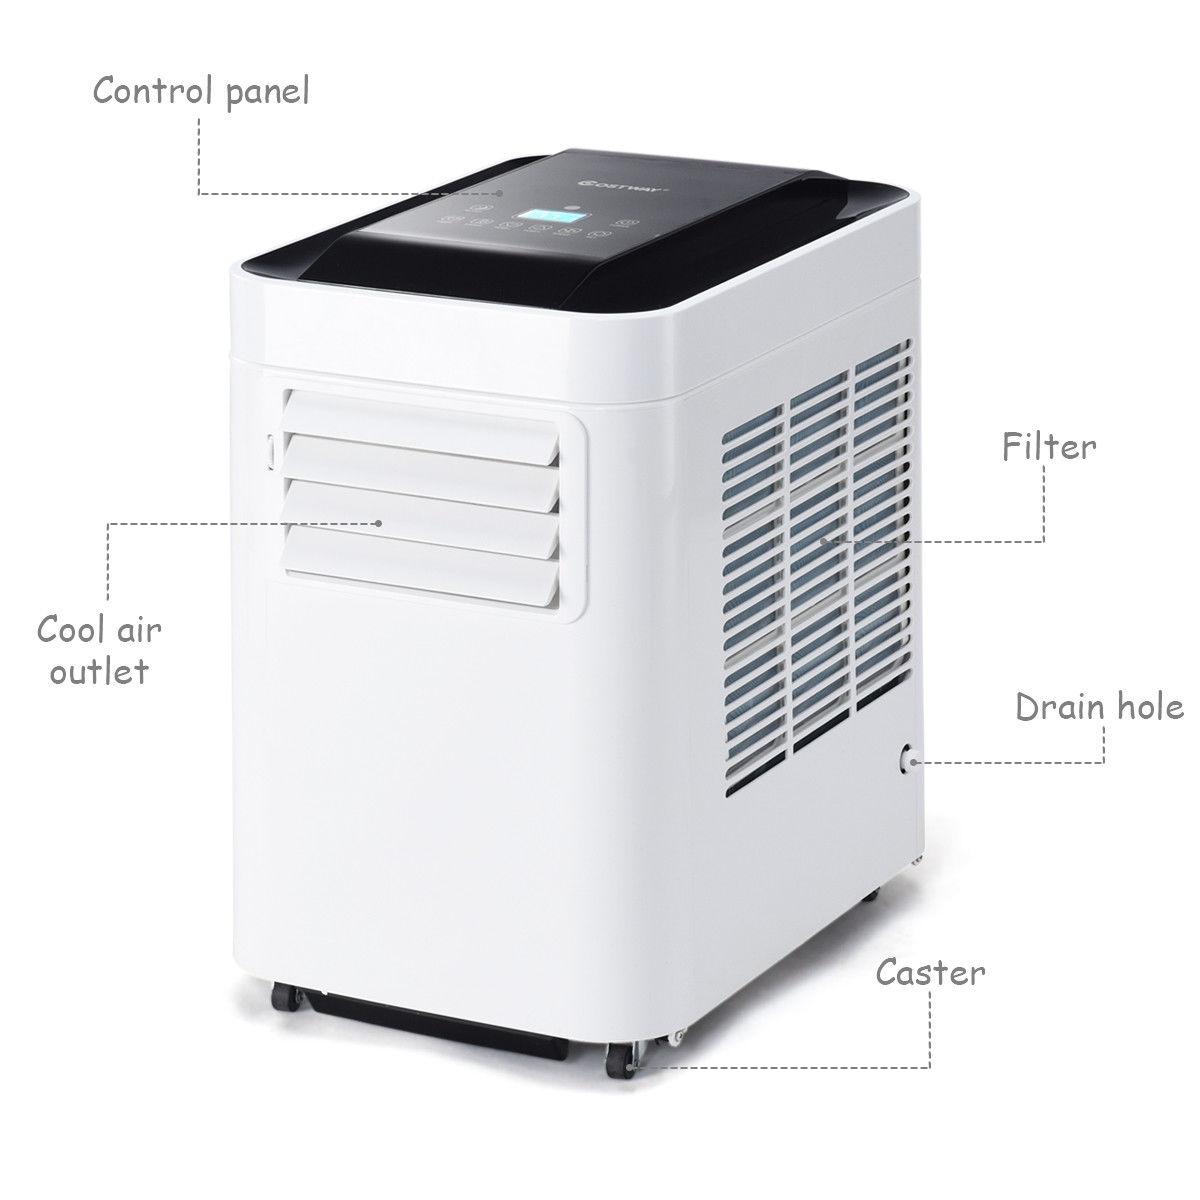 Portable Air Conditioner 10000BTU AC Unit & Dehumidifier w/ Remote Control